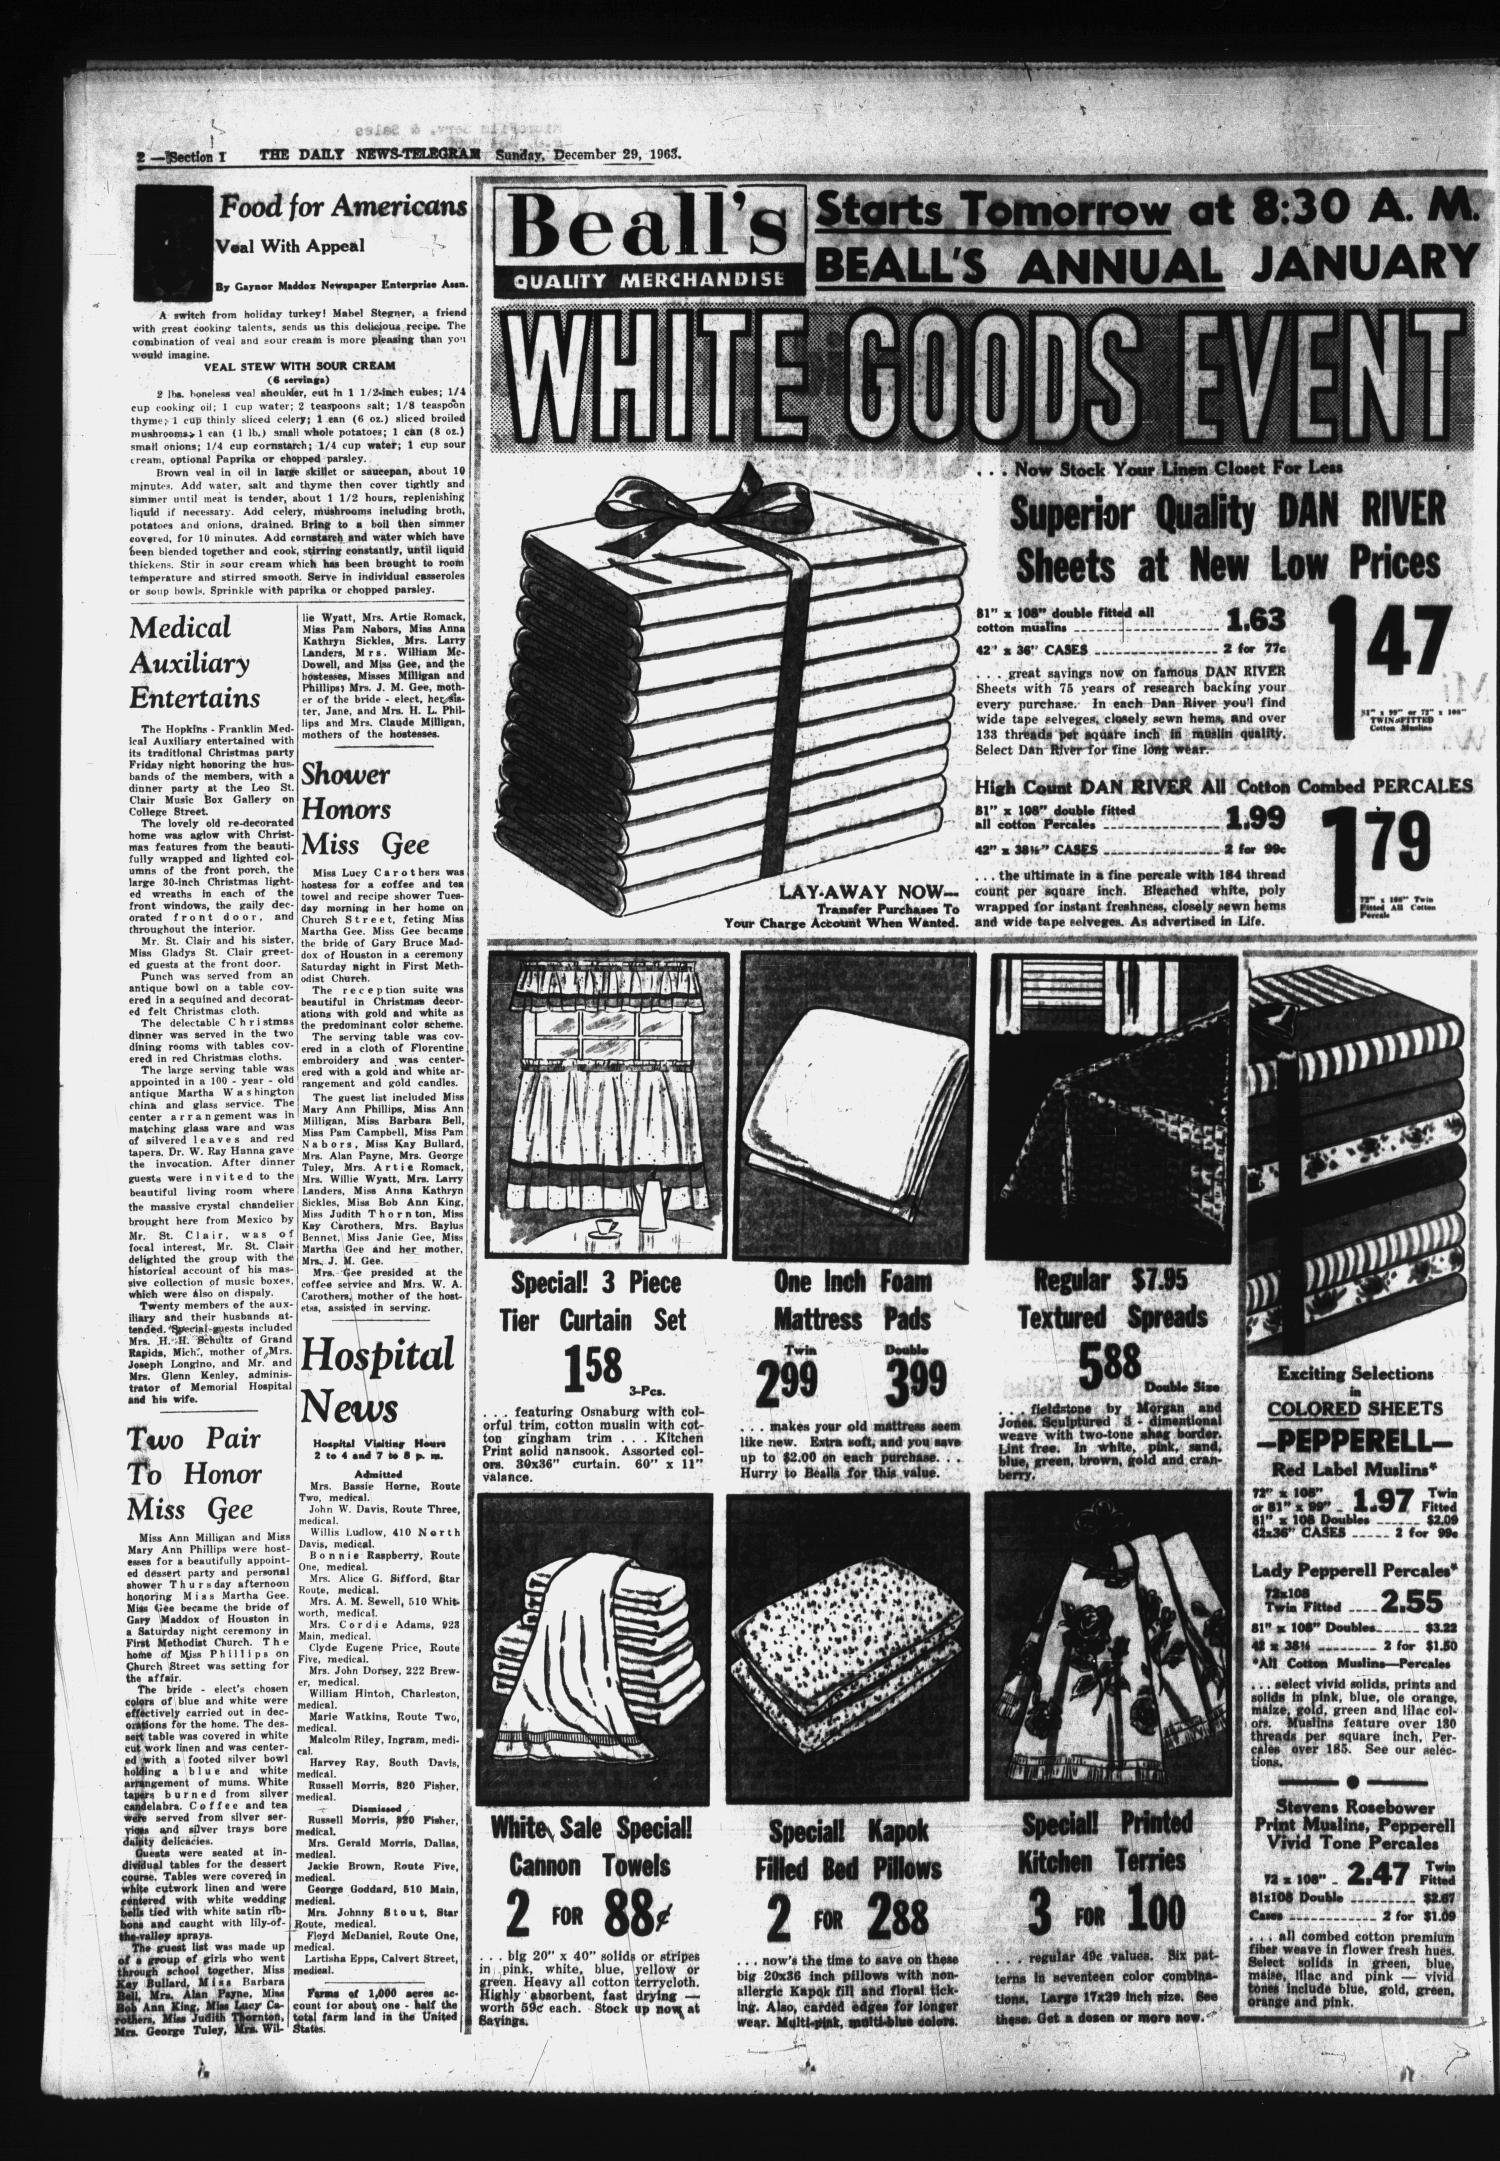 The Daily News-Telegram (Sulphur Springs, Tex ), Vol  85, No  305